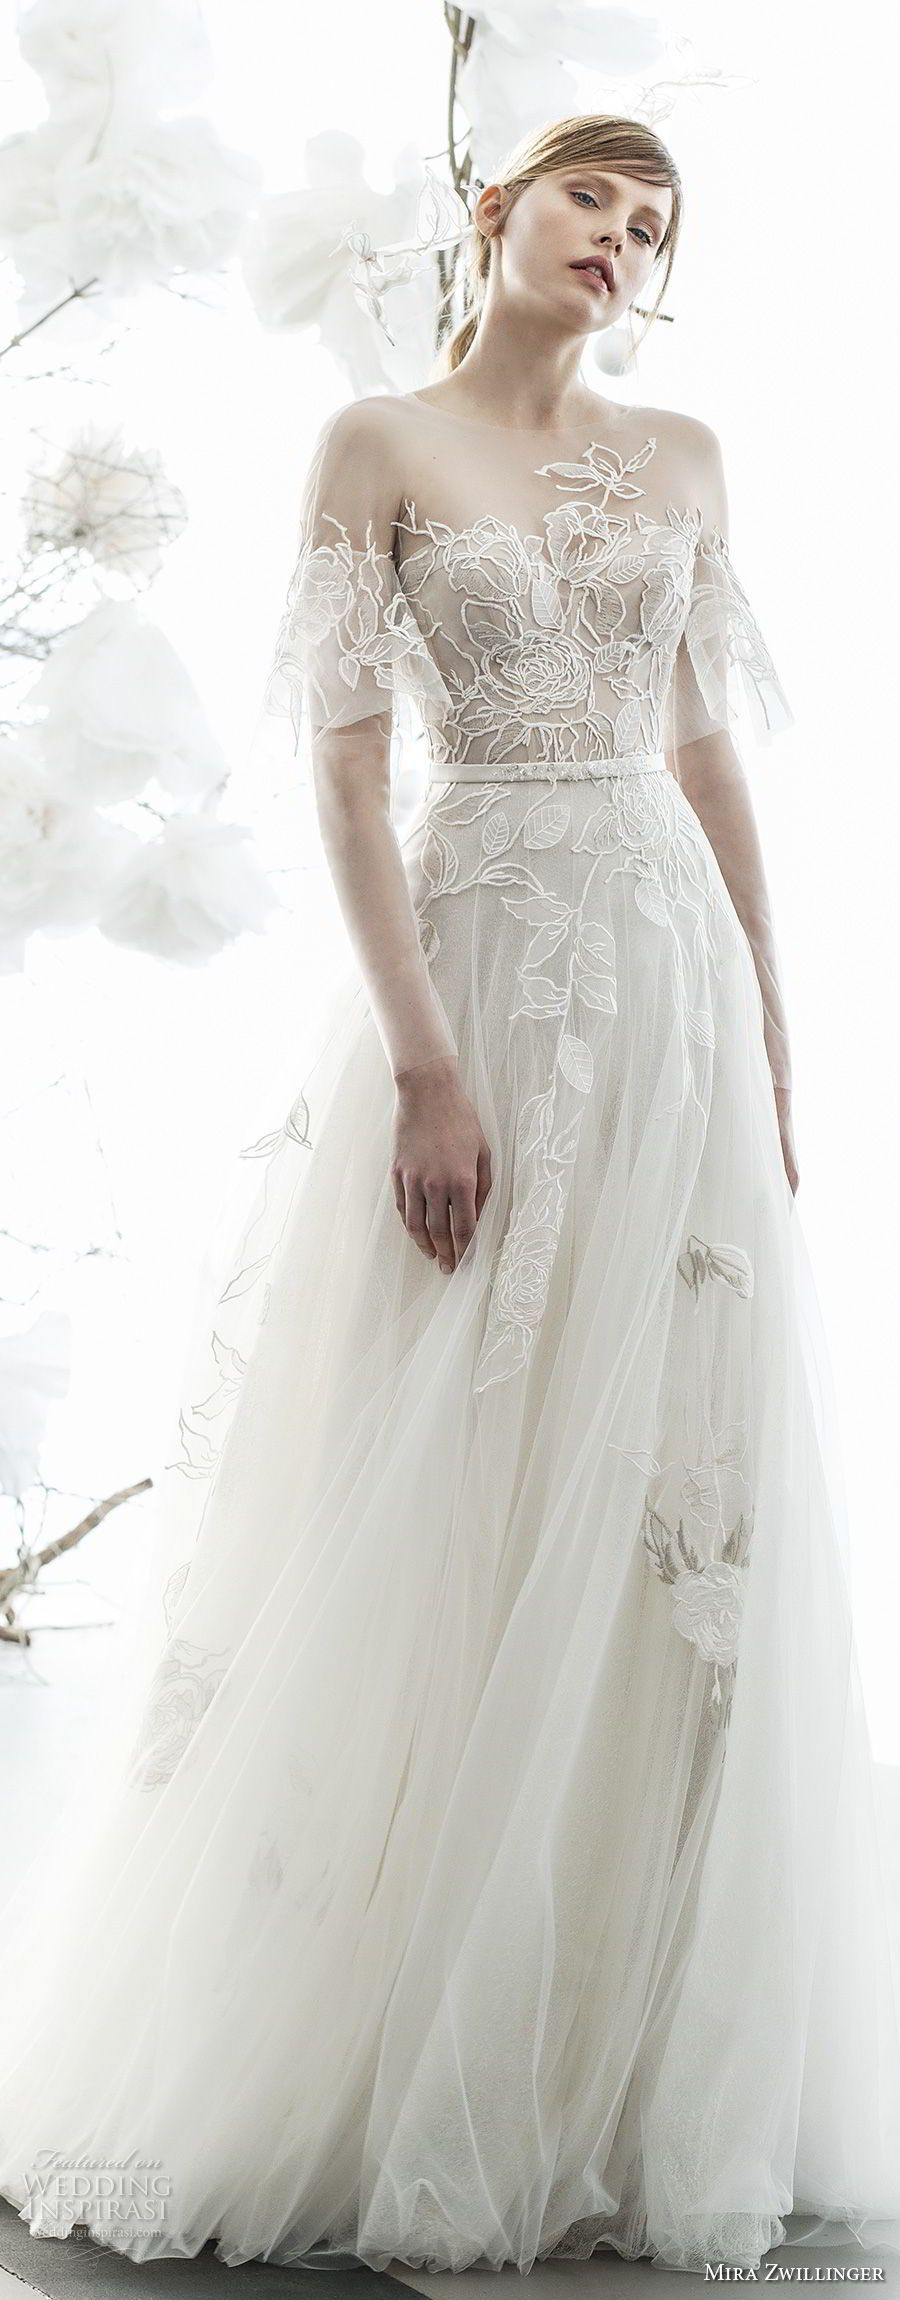 Mira zwillinger bridal long sleeves illusion bateau sweetheart